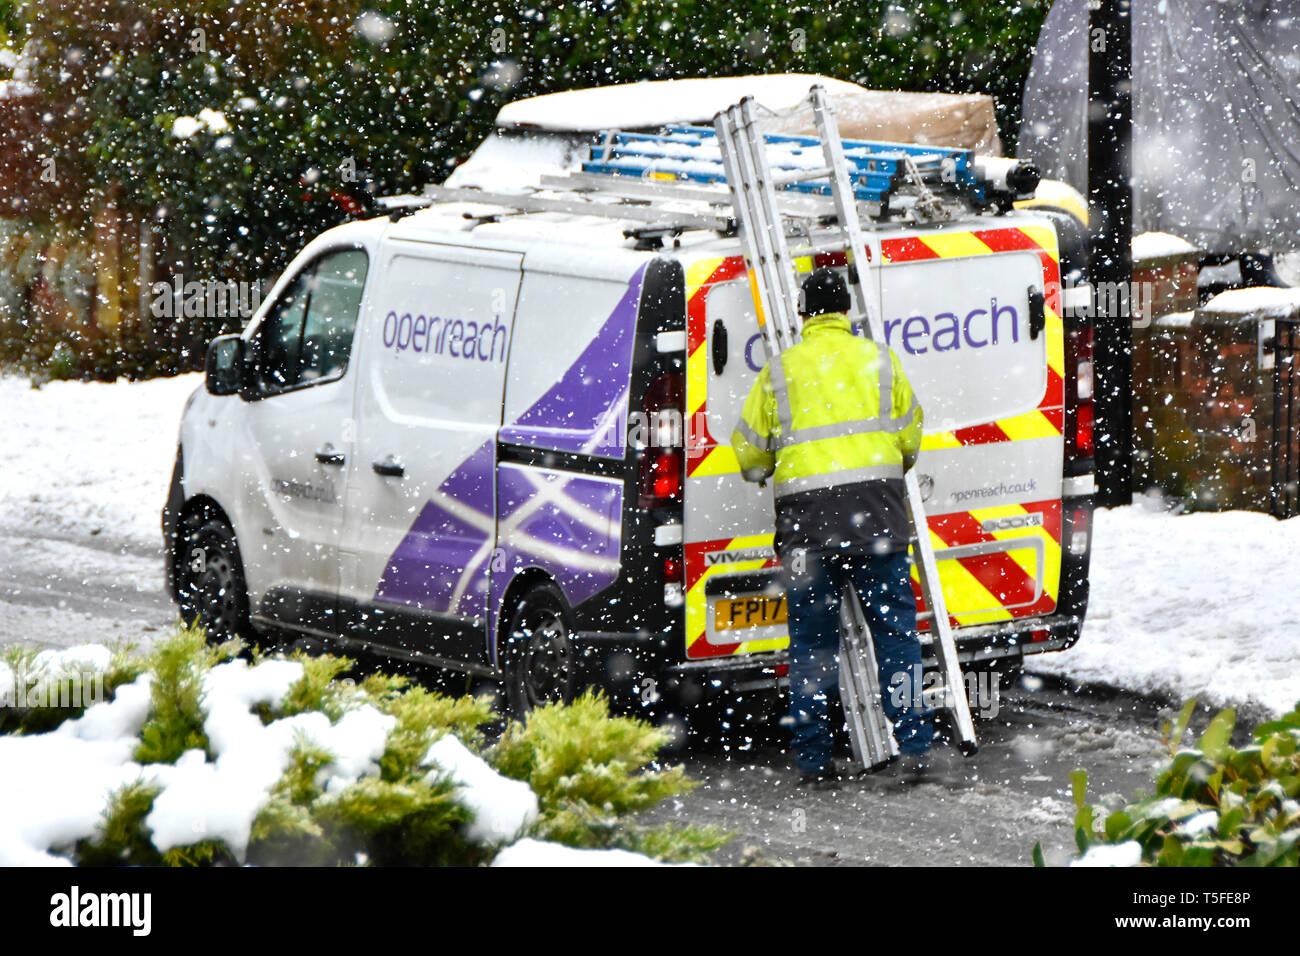 Winter weather snowy street scene snowflakes around BT Openreach van & engineer high vis jacket working with ladder in falling snow storm England UK - Stock Image